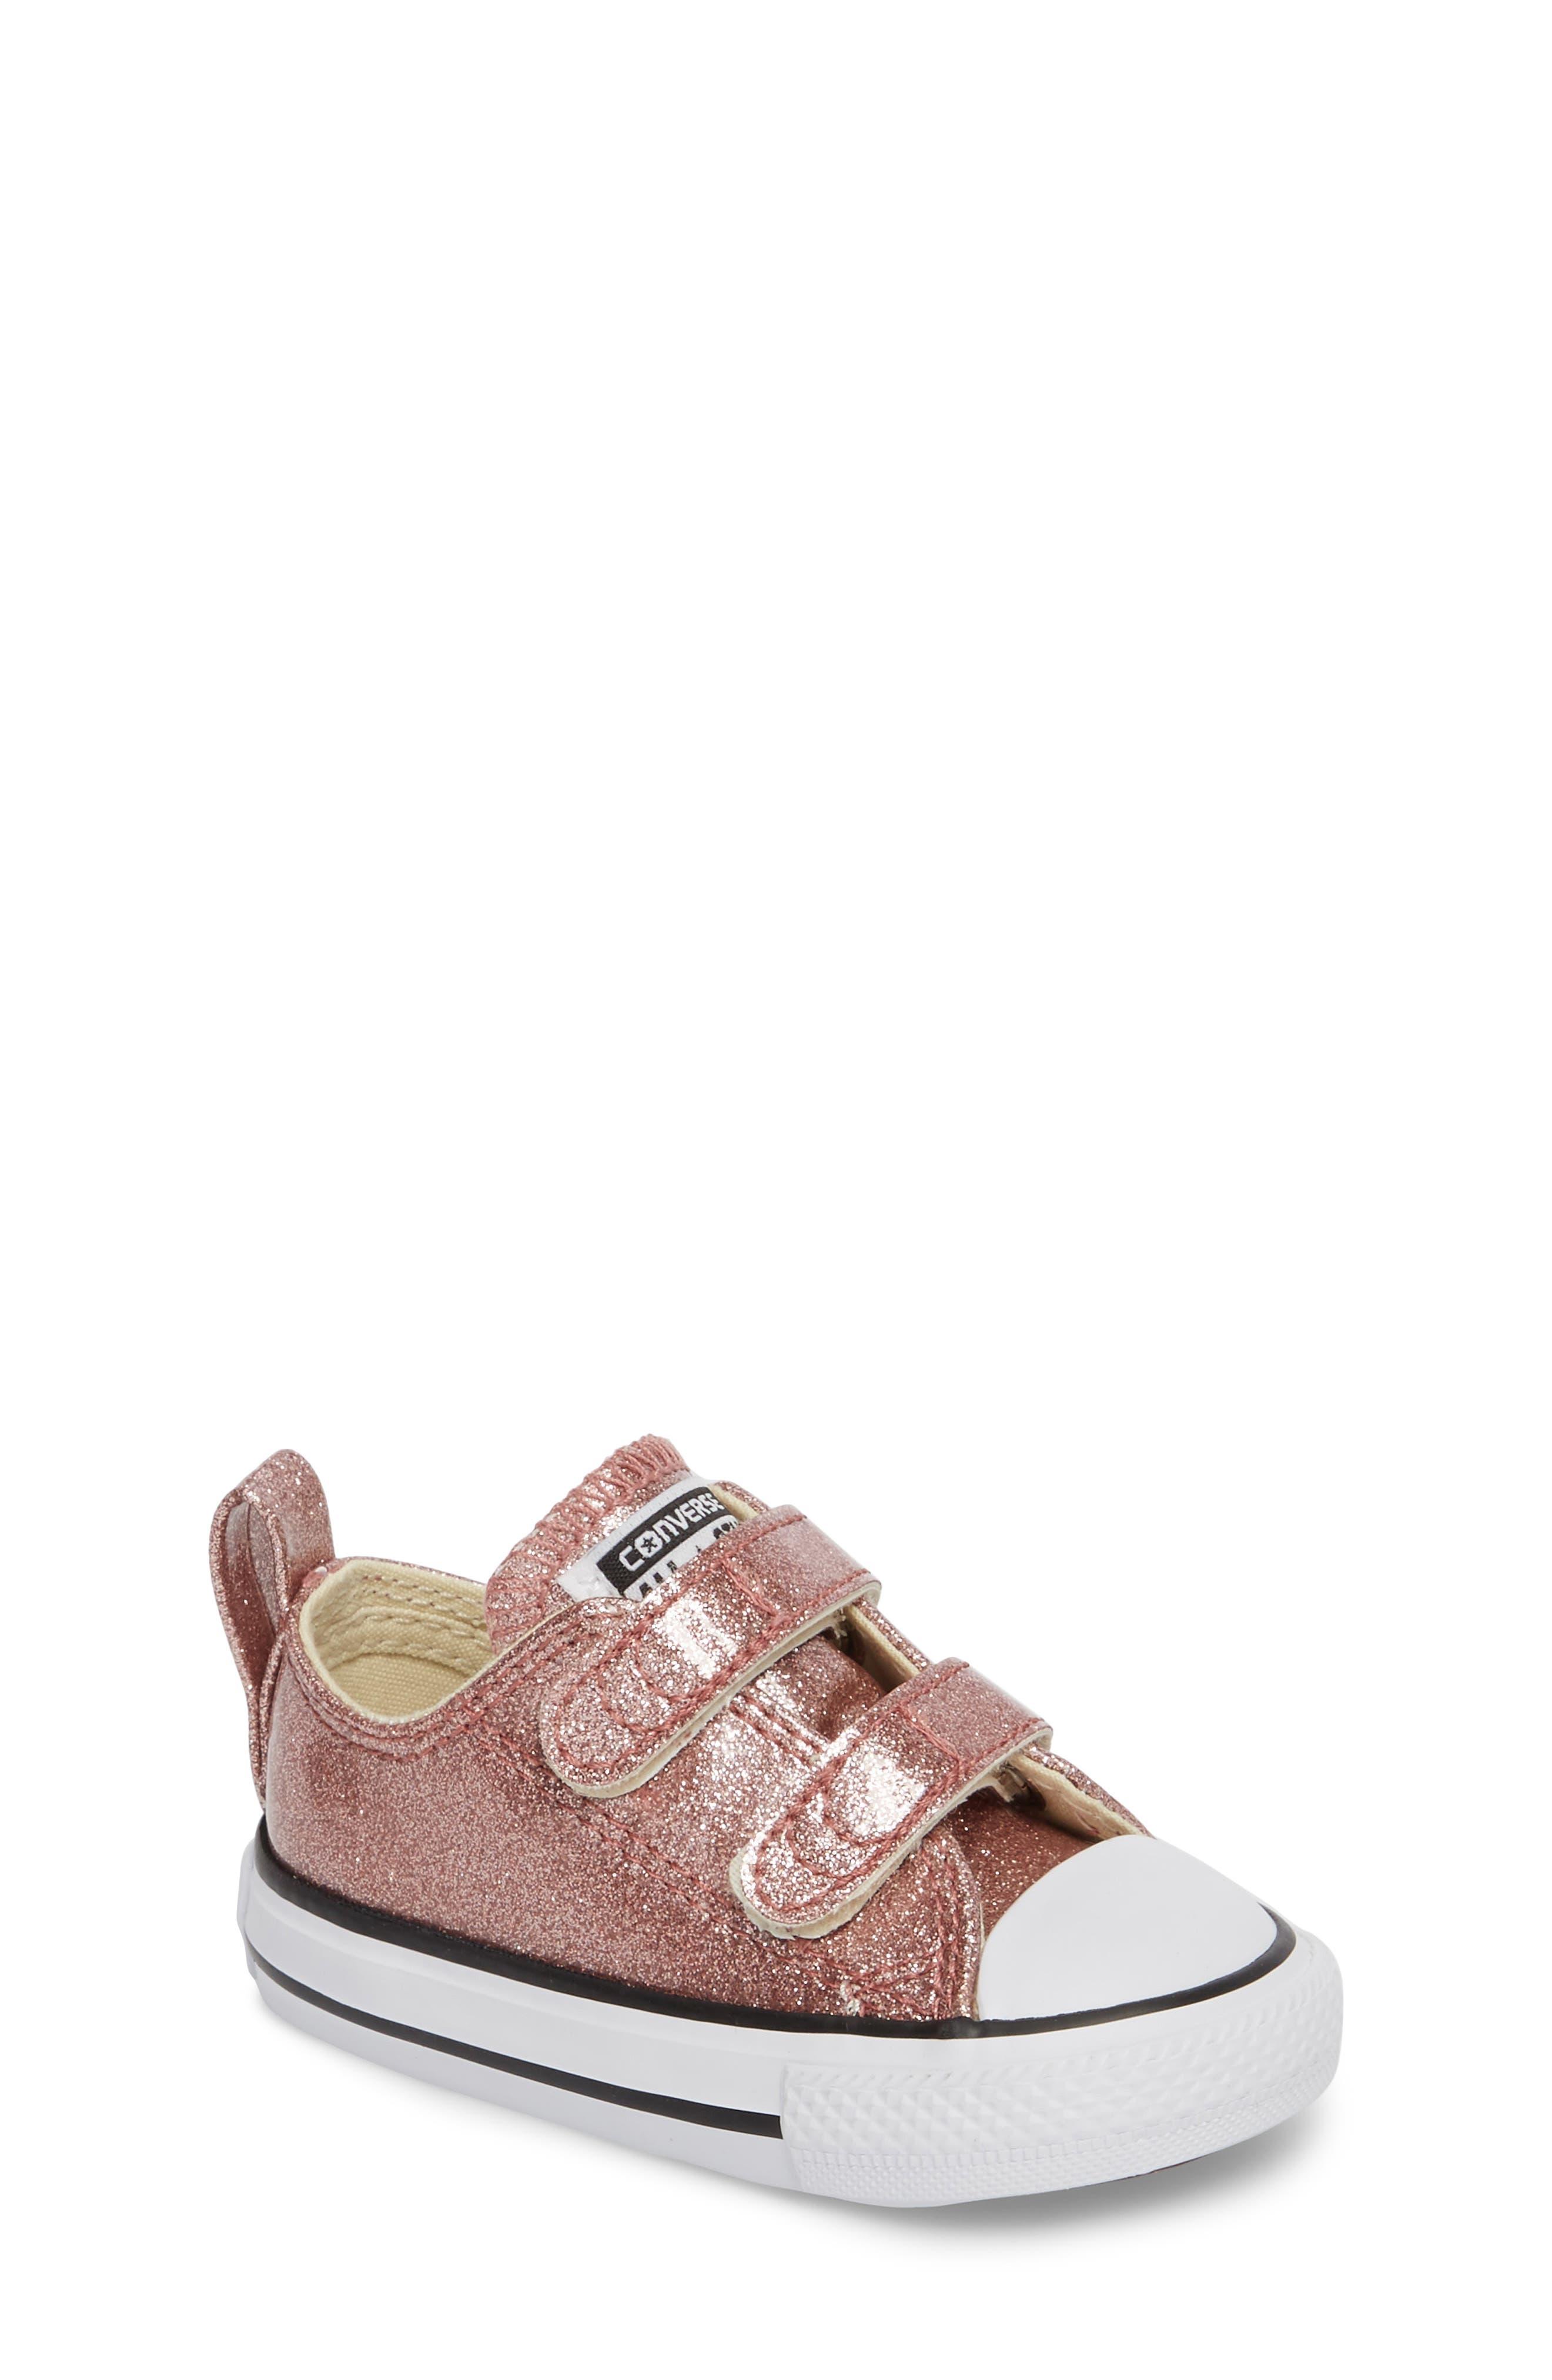 Converse Chuck Taylor® All Star® Glitter Slip-On (Baby, Walker, Toddler, Little Kid & Big Kid)